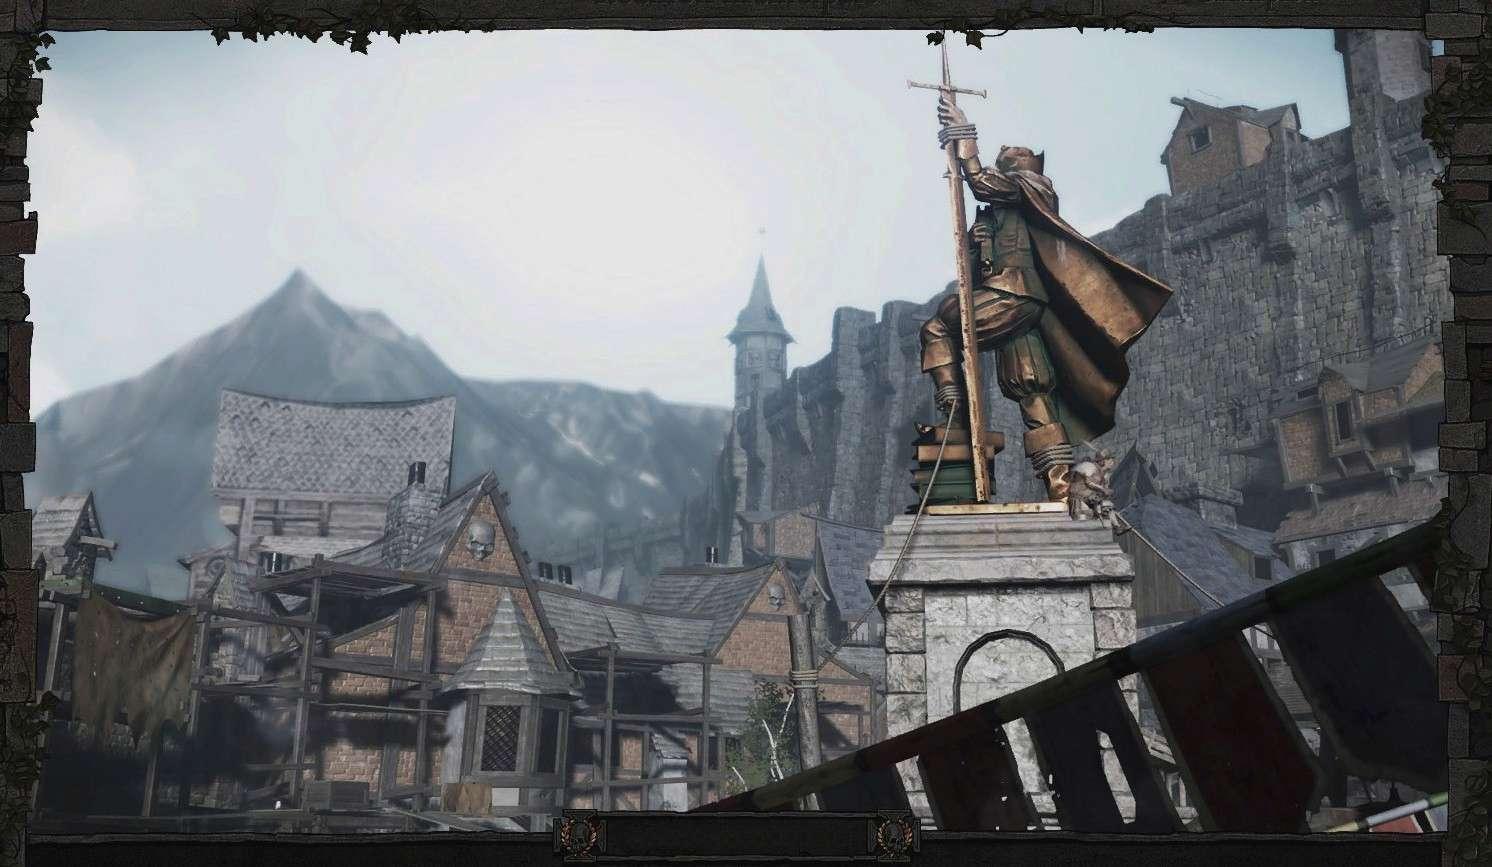 Ubersreik - Informations sorties du jeu Vermintide Place_10